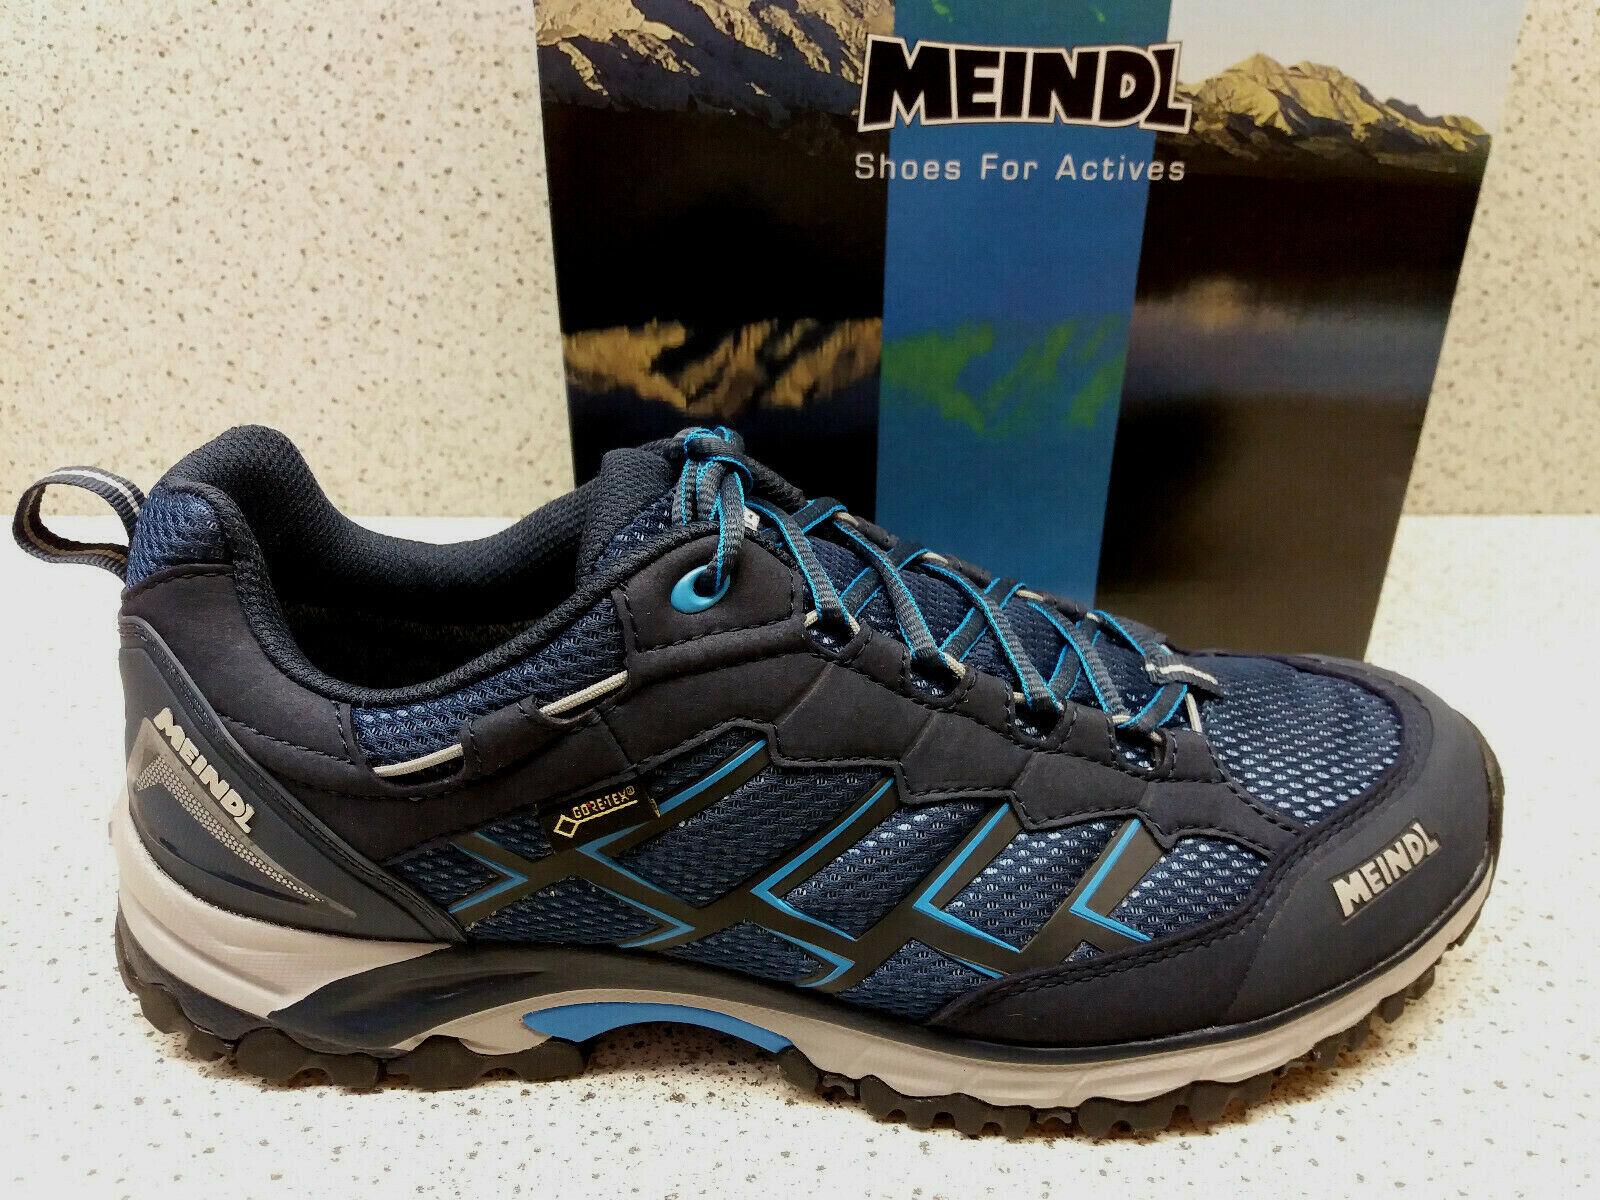 MEINDL ® finora 149,95  autoibe GTX GORETEX ® uomini BLU m21